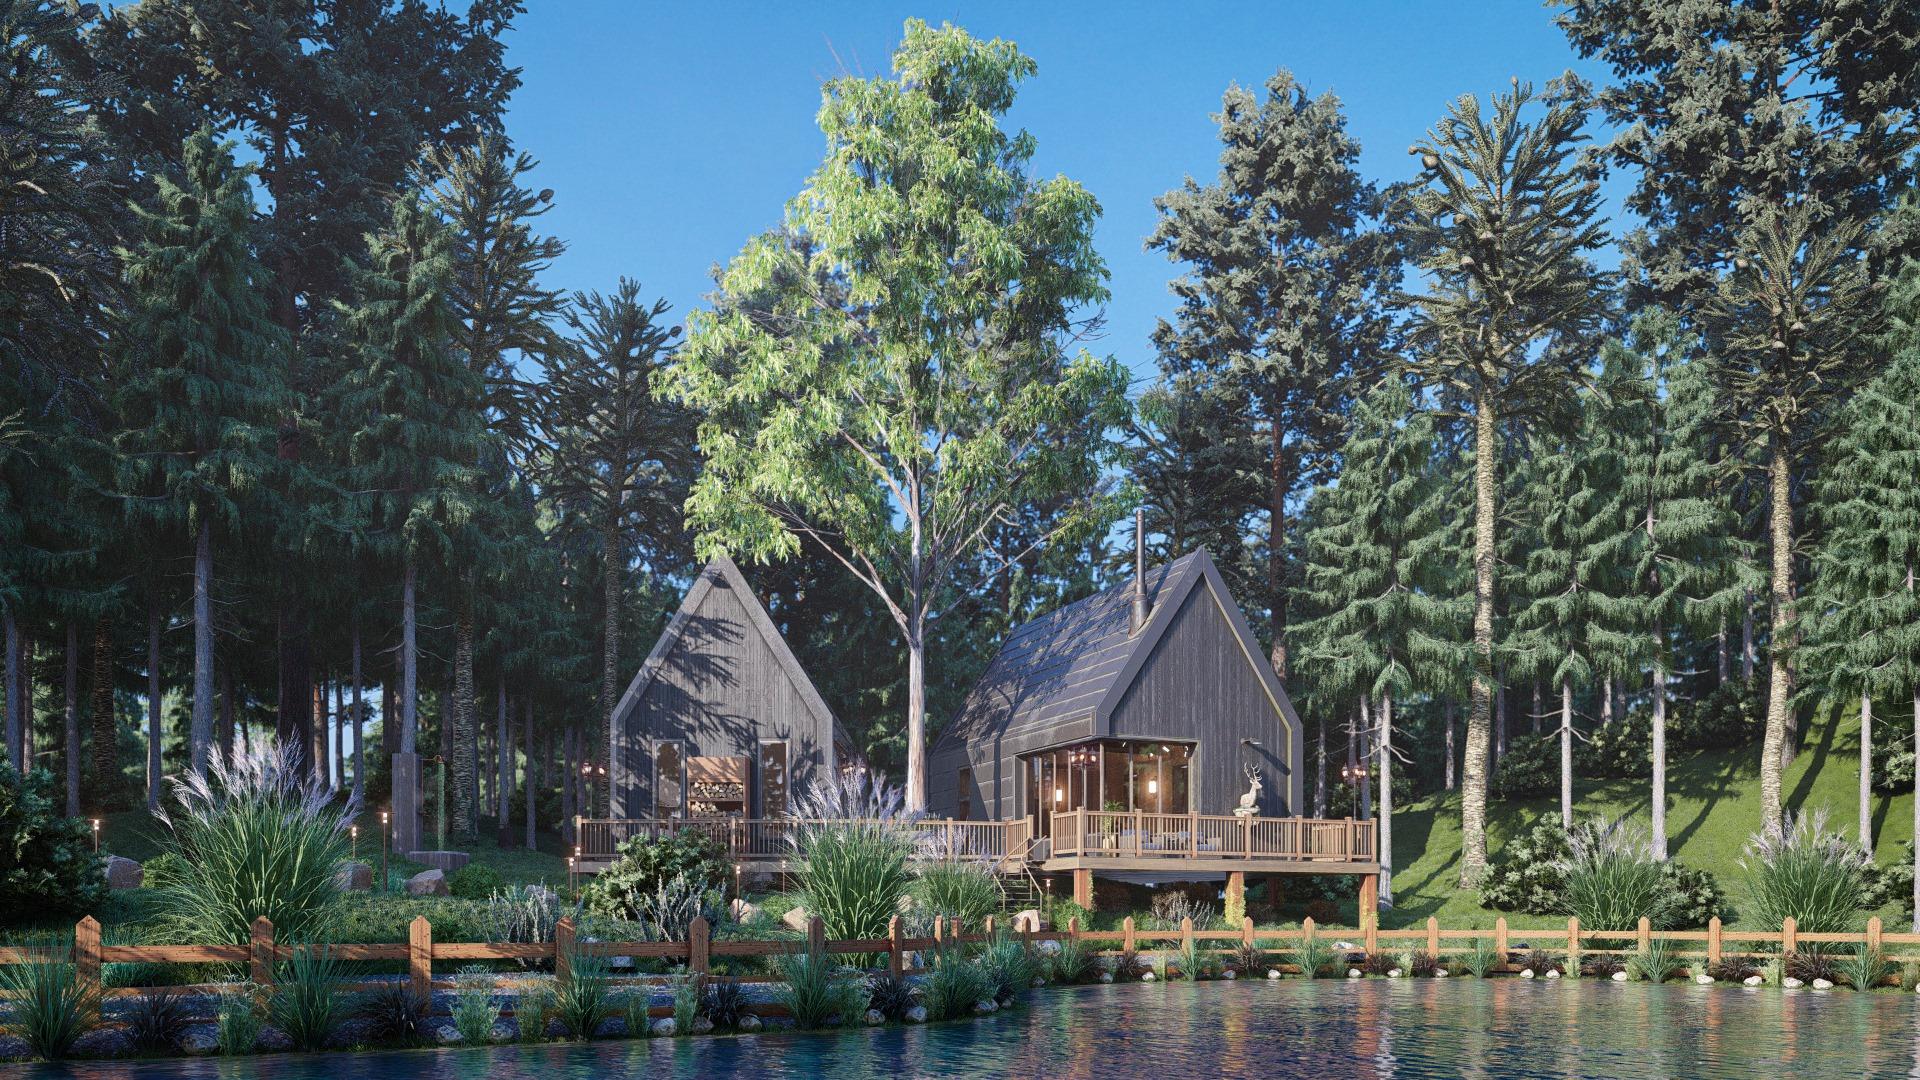 Cabin by the lake, rendered in Lumion by Arsalan Mohaghegh Honarvar of Honarvar Design Studio.